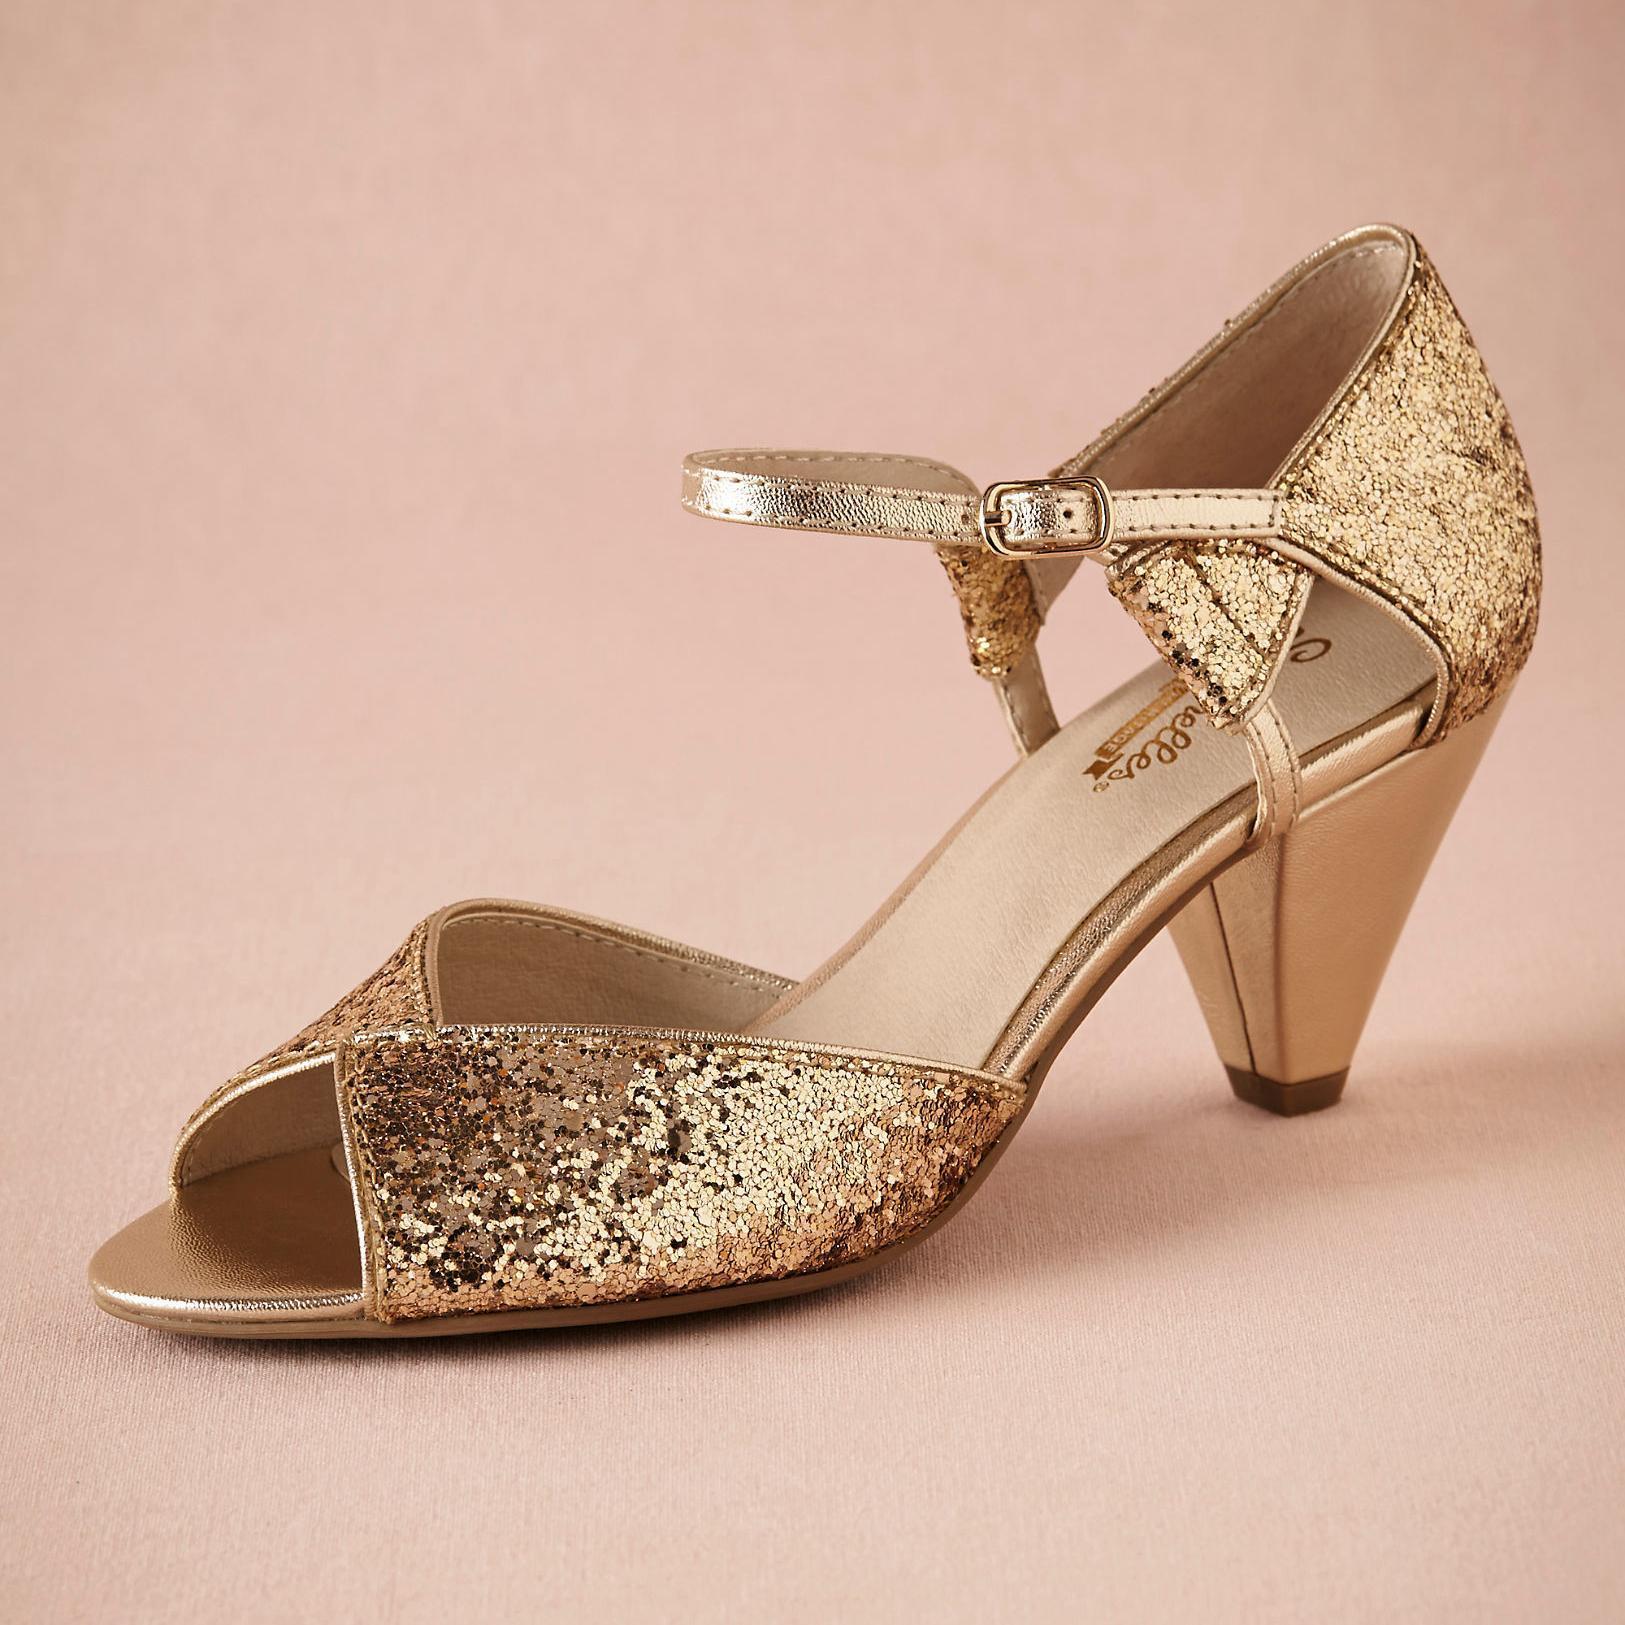 Colored Wedding Shoes 002 - Colored Wedding Shoes